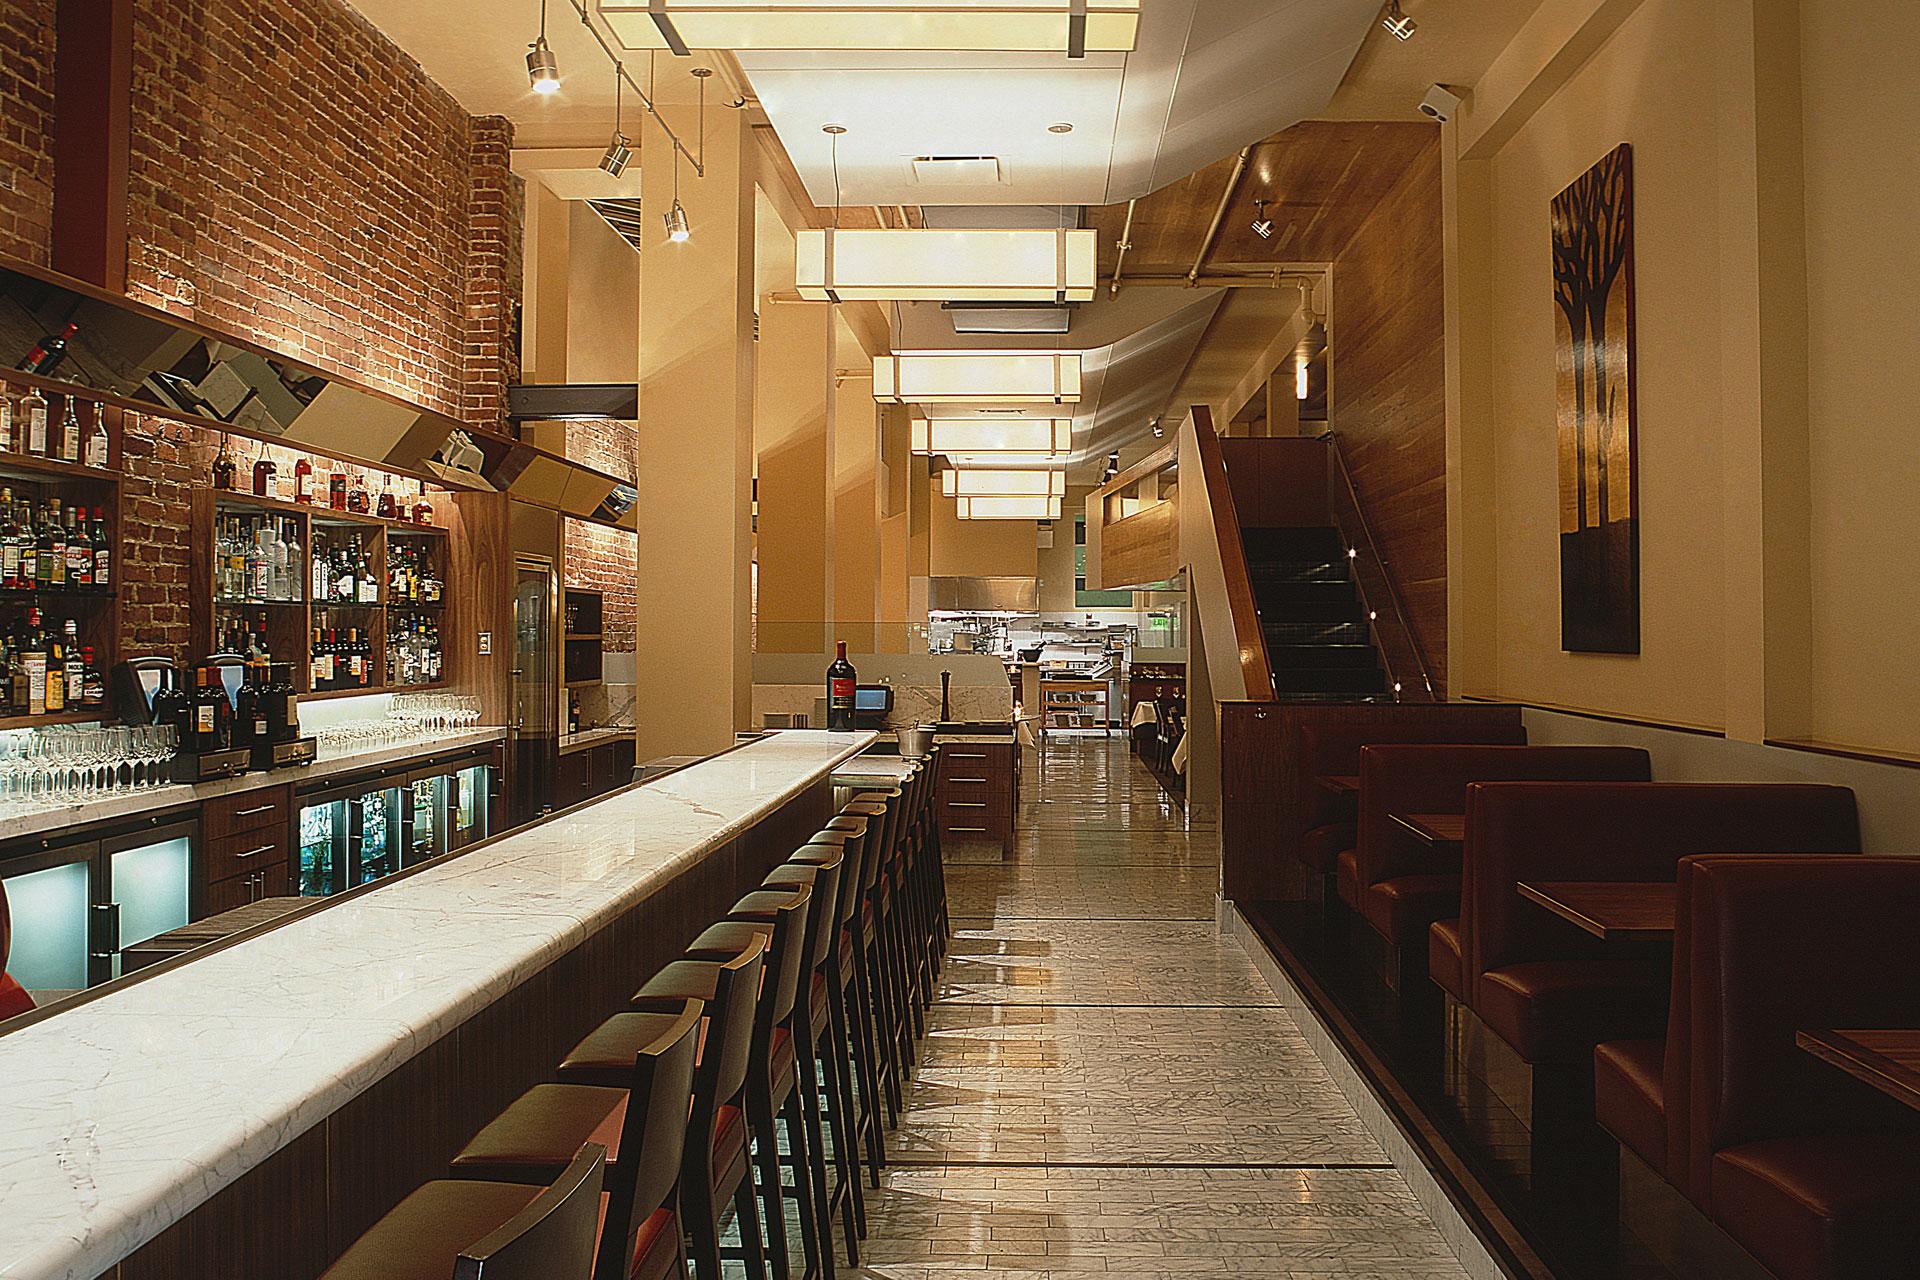 Perbacco restaurant decor